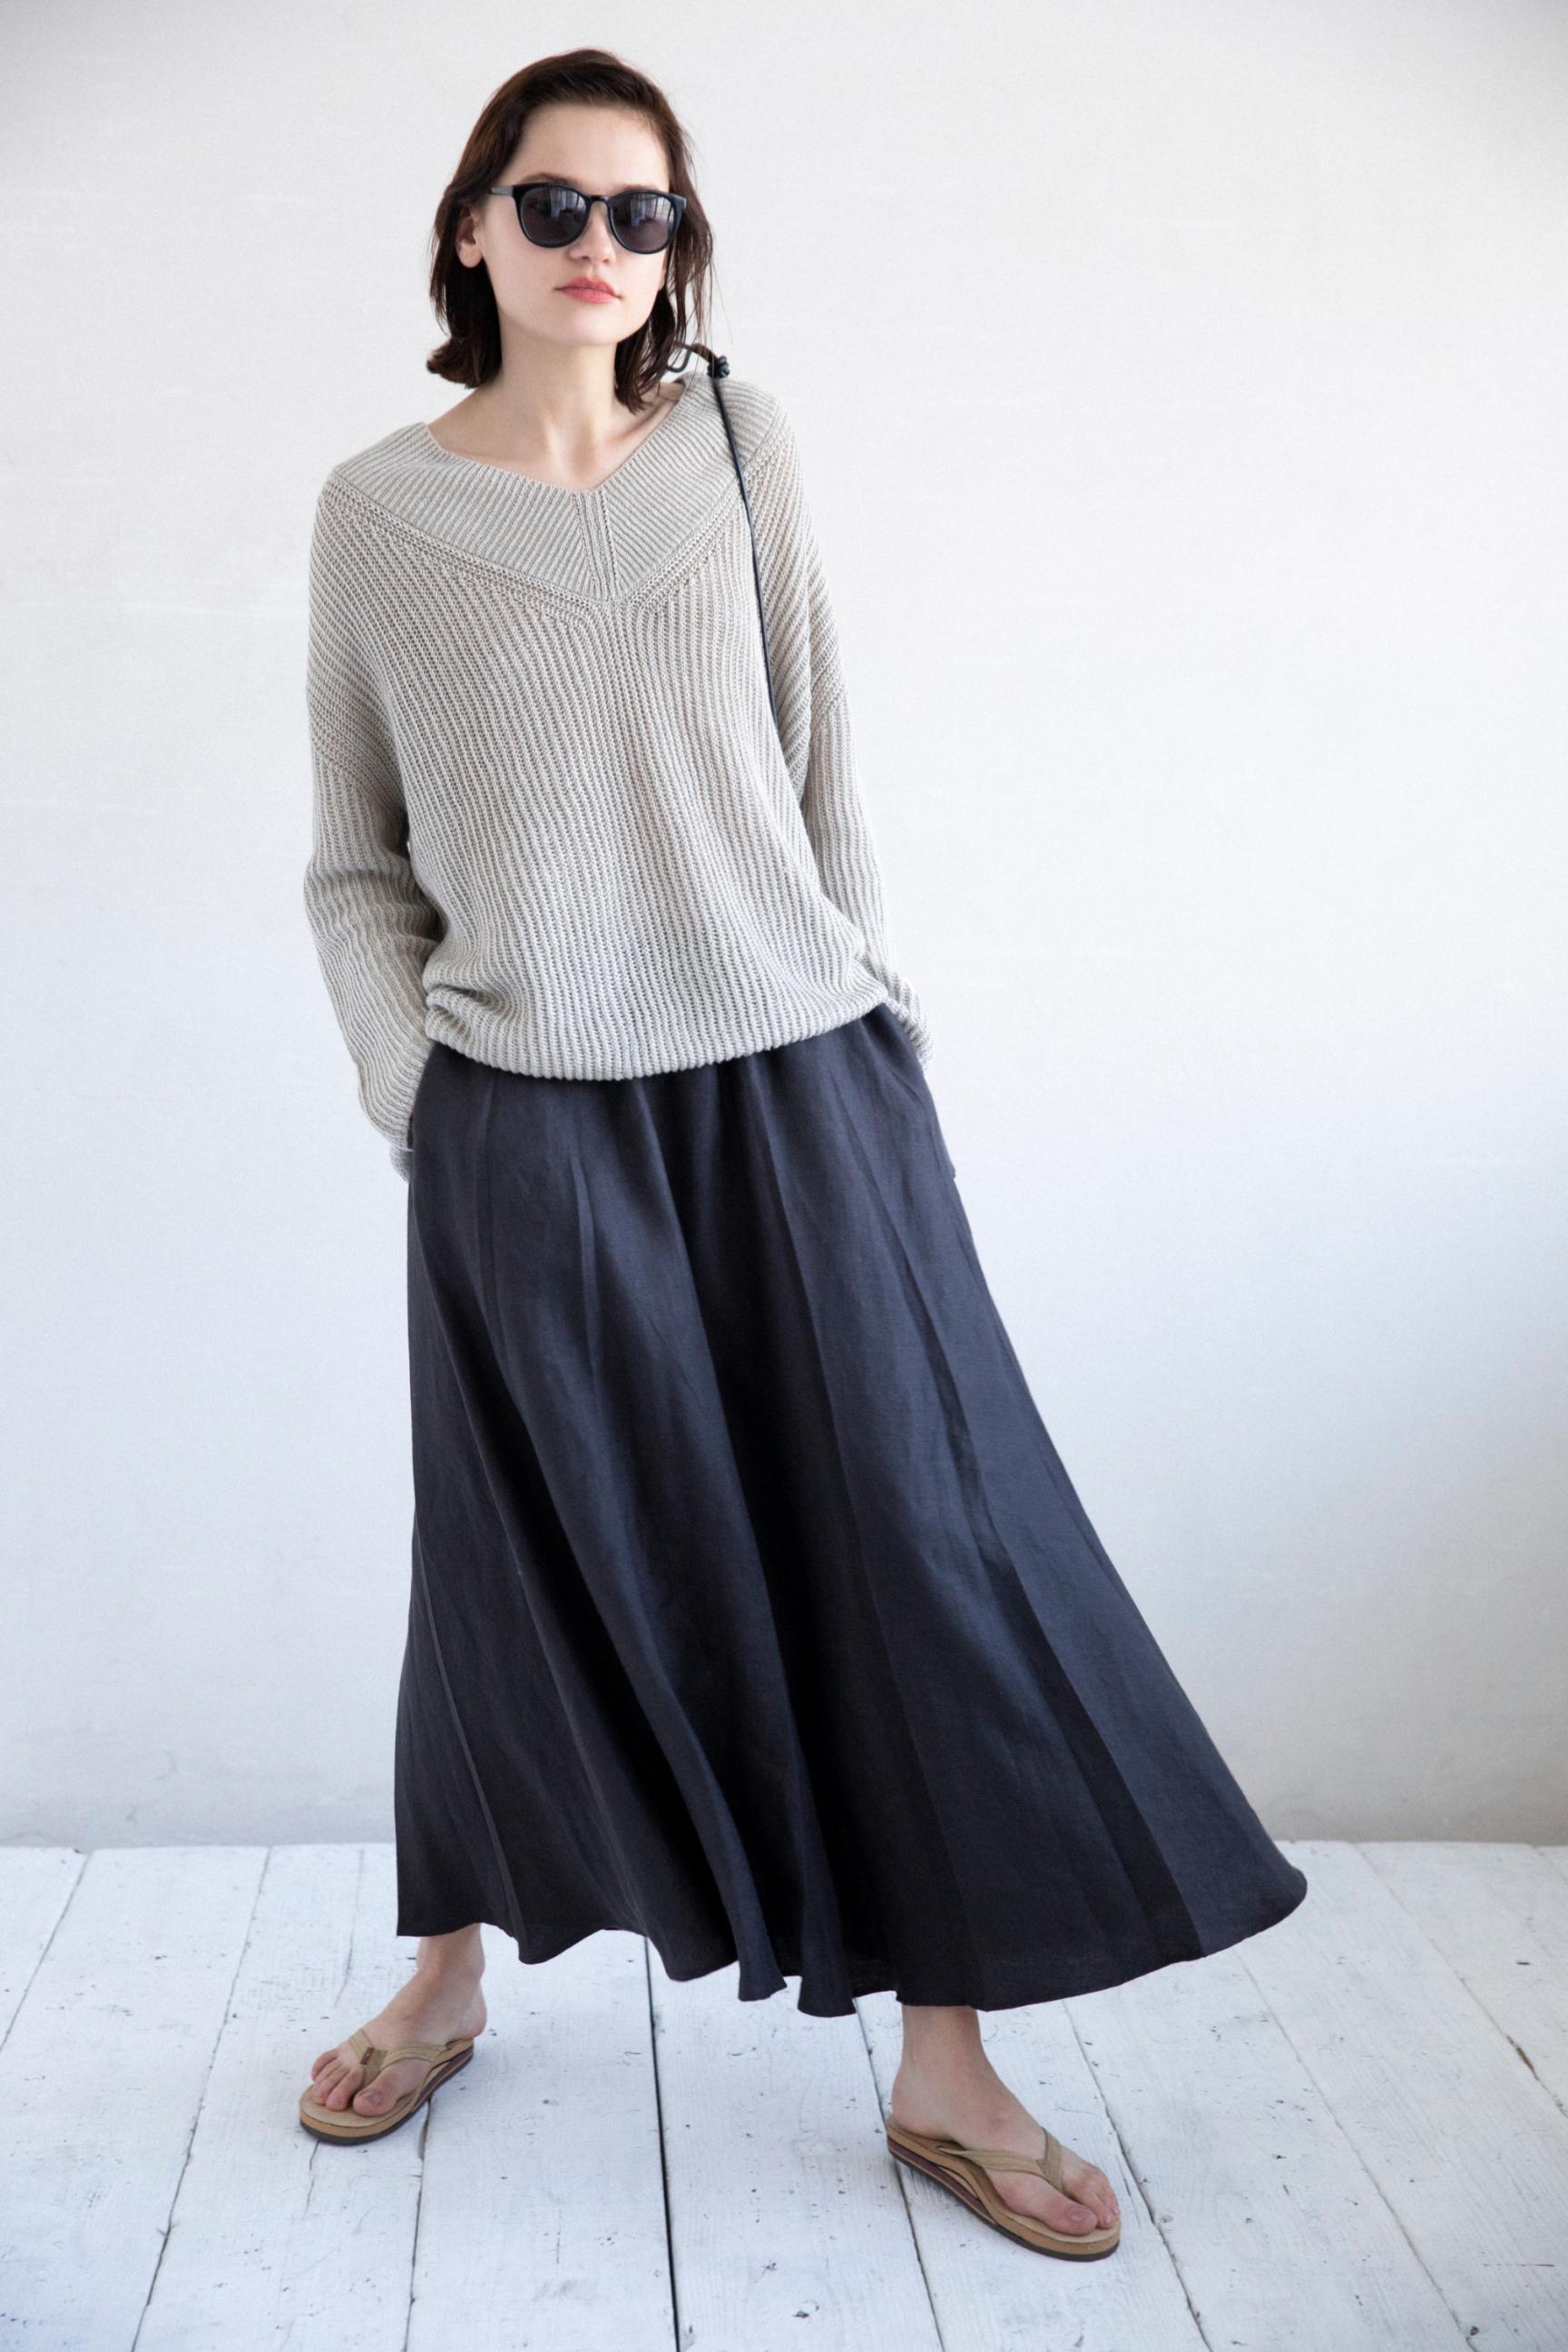 39_2 knit¥25,300 skirt¥31,900 sunglasses¥20,900 bag¥24,200 shoes¥13,200